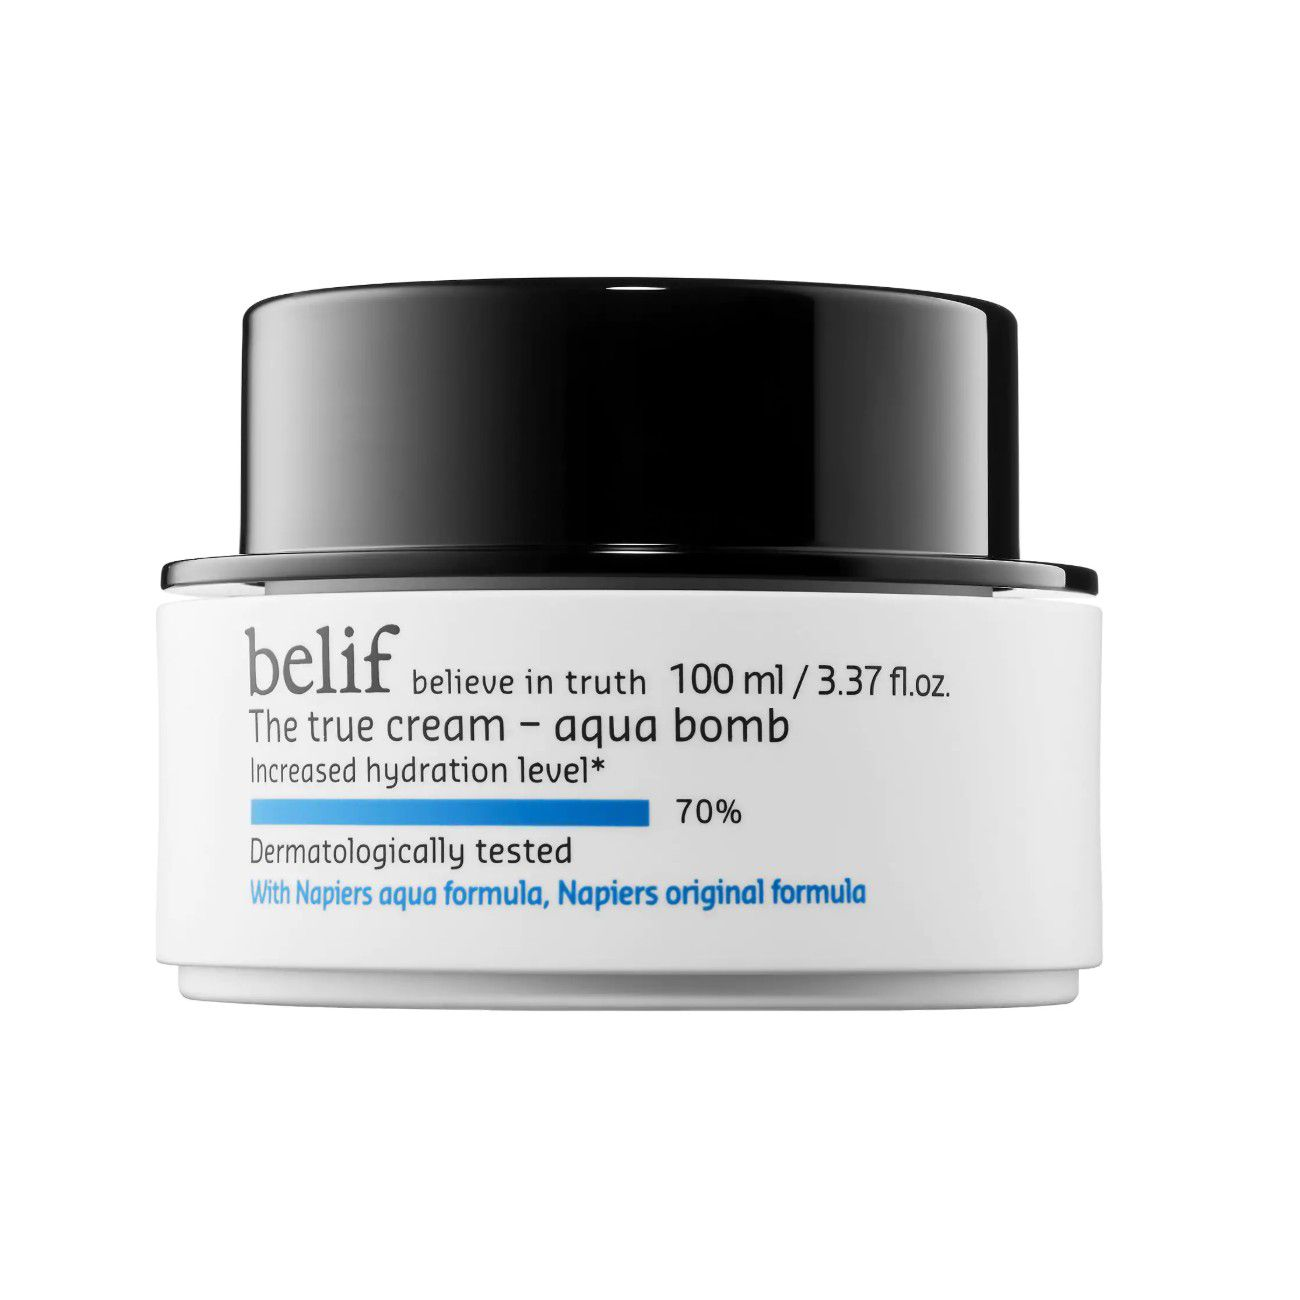 White jar of belif The True Cream- Aqua Bomb on a white background.